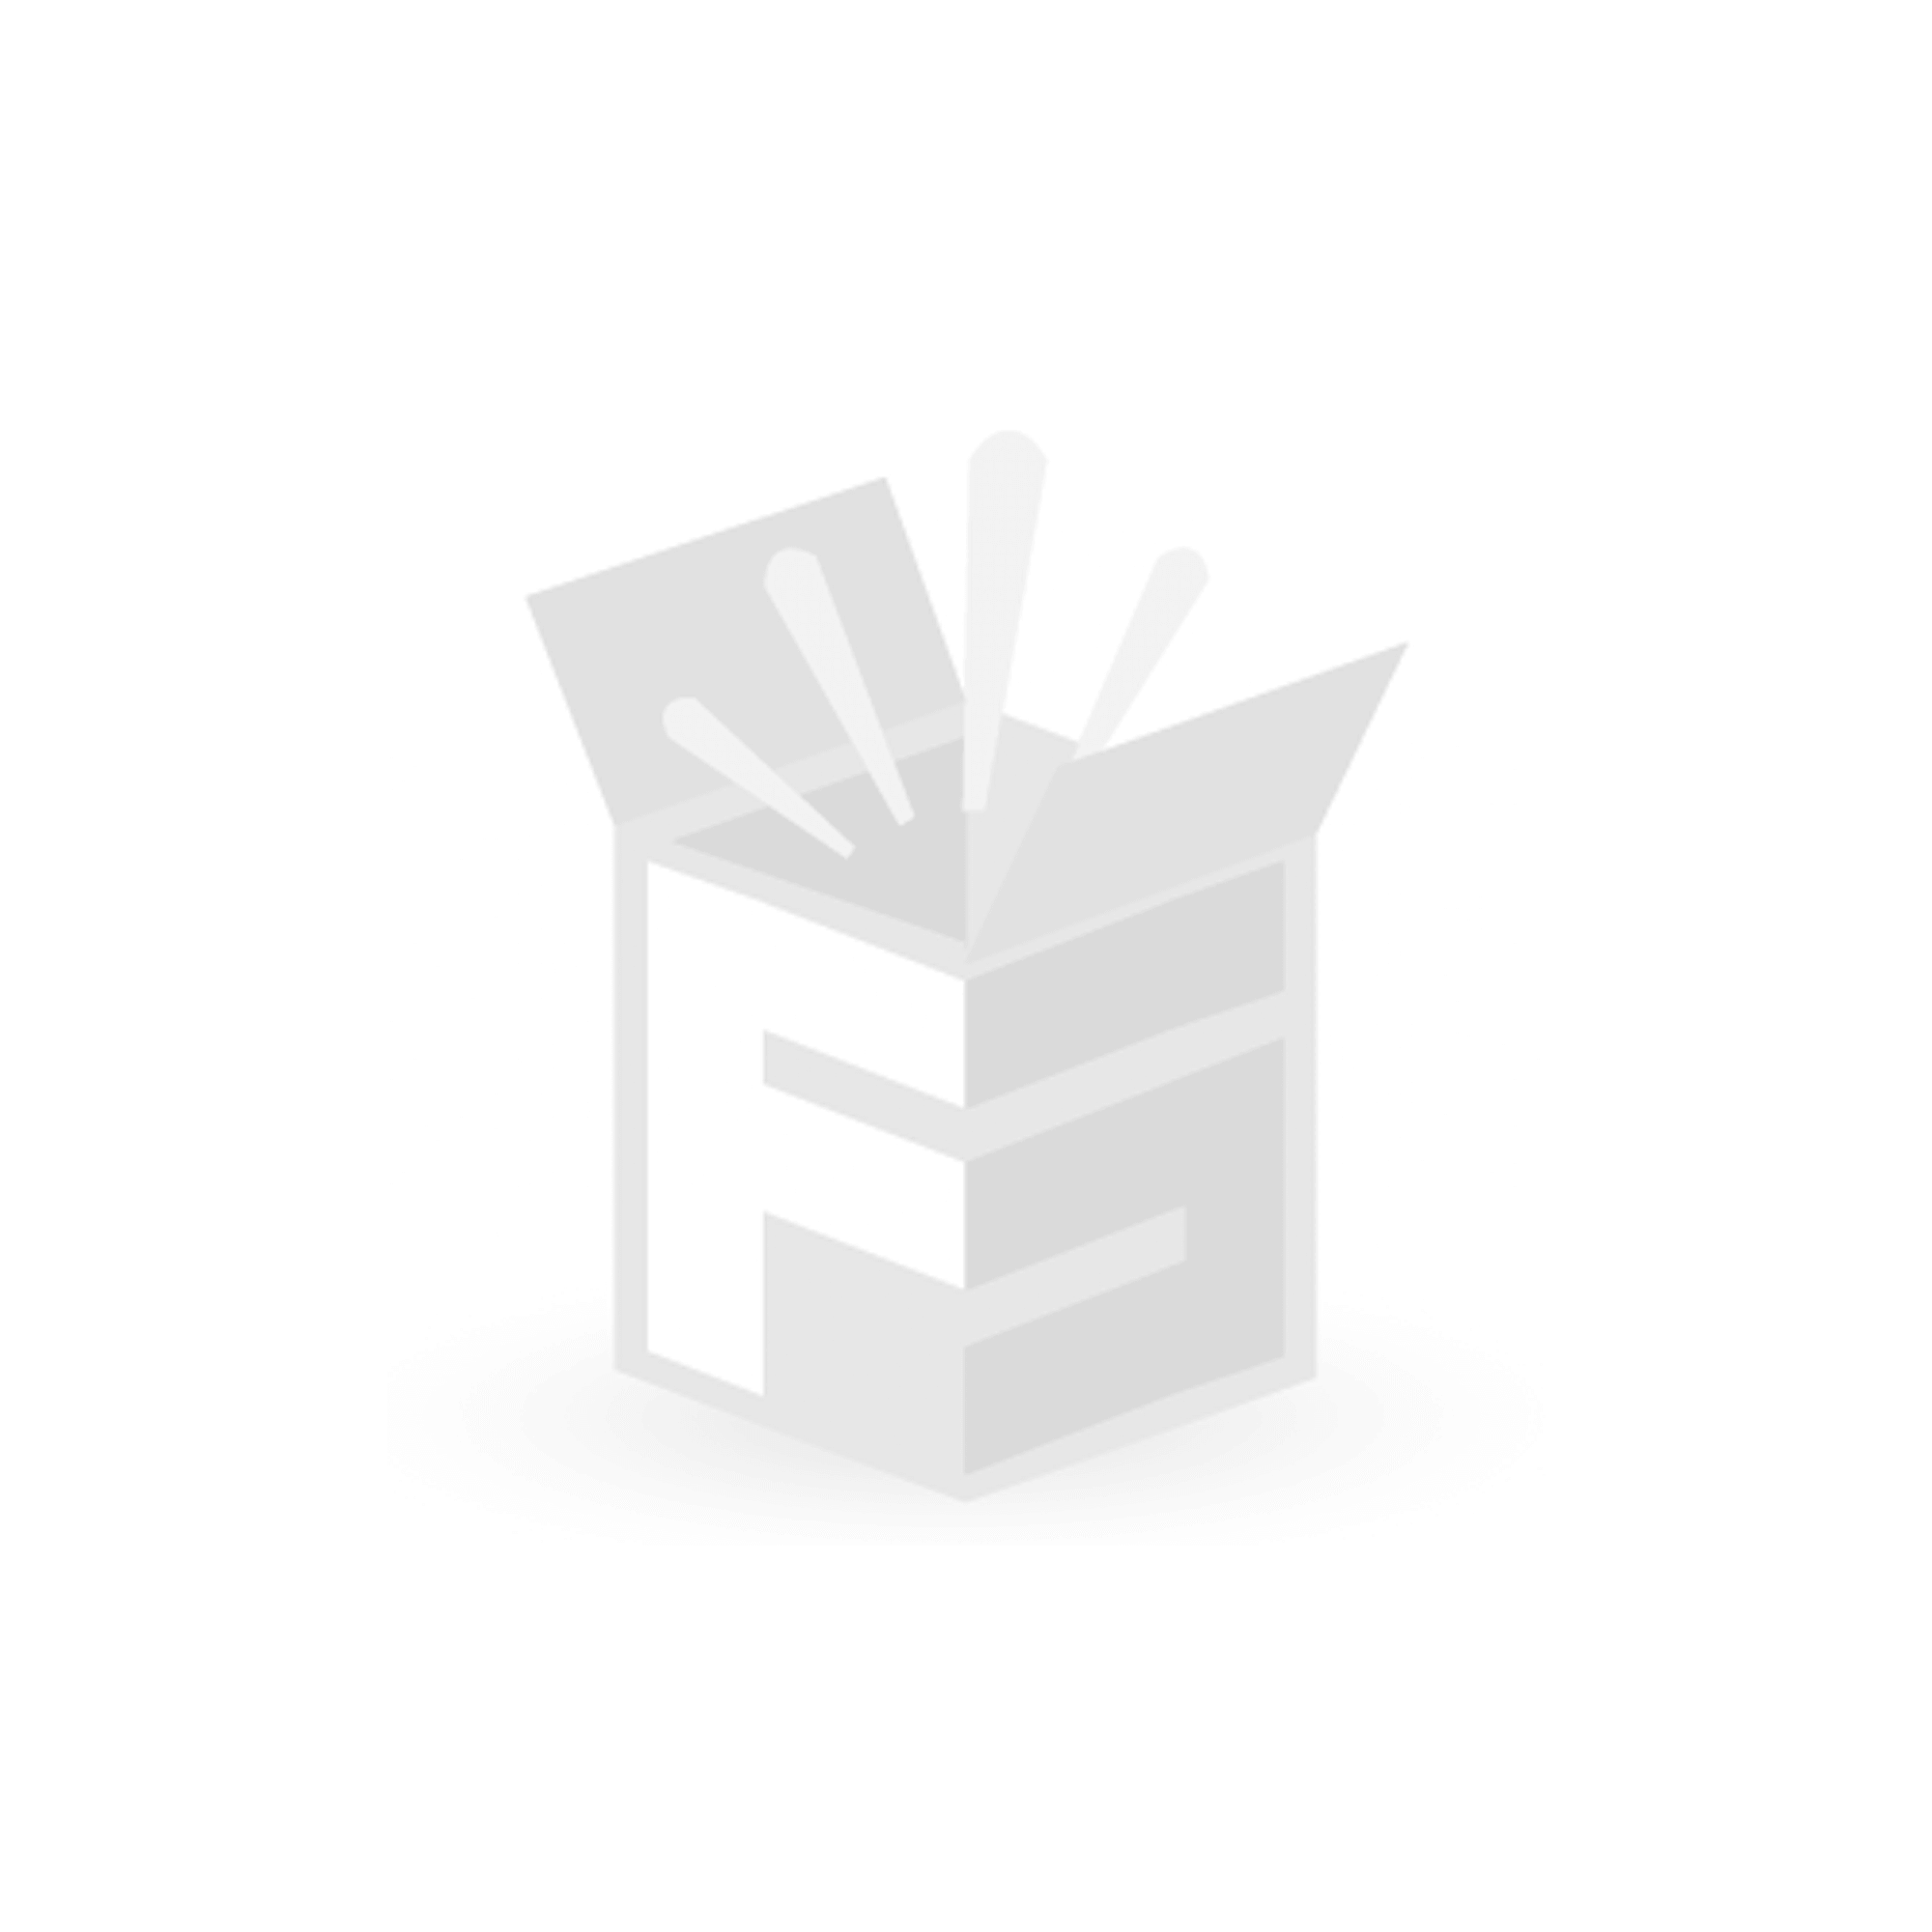 Kinzo Steckschlüssel-Set 108-teilig